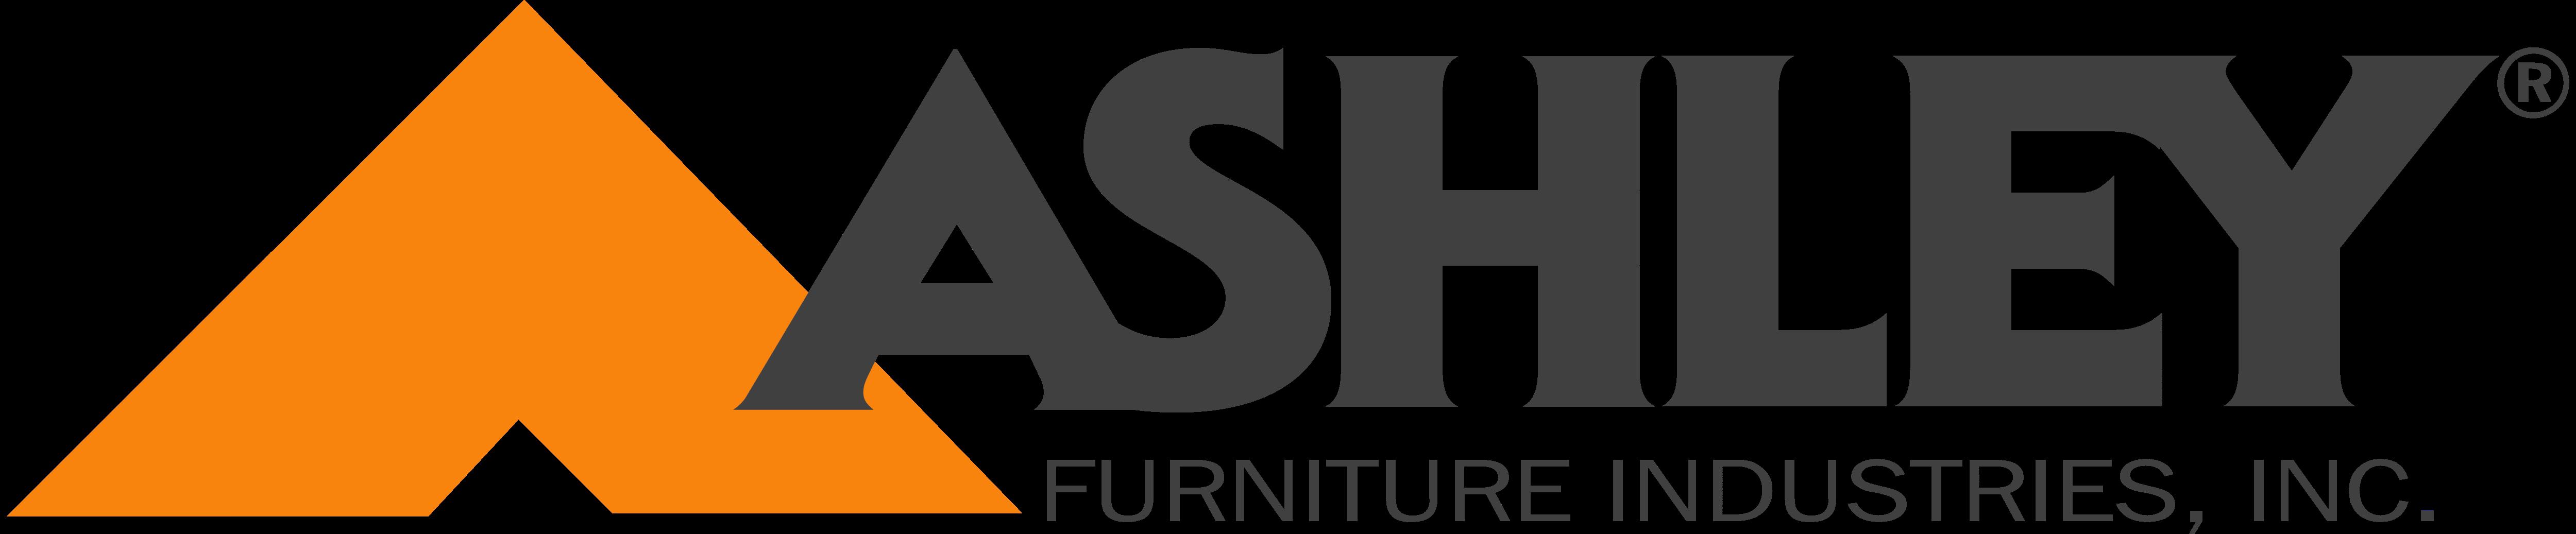 Ashley Furniture Logo, Logotype - Ashley Furniture Homestore Vector, Transparent background PNG HD thumbnail